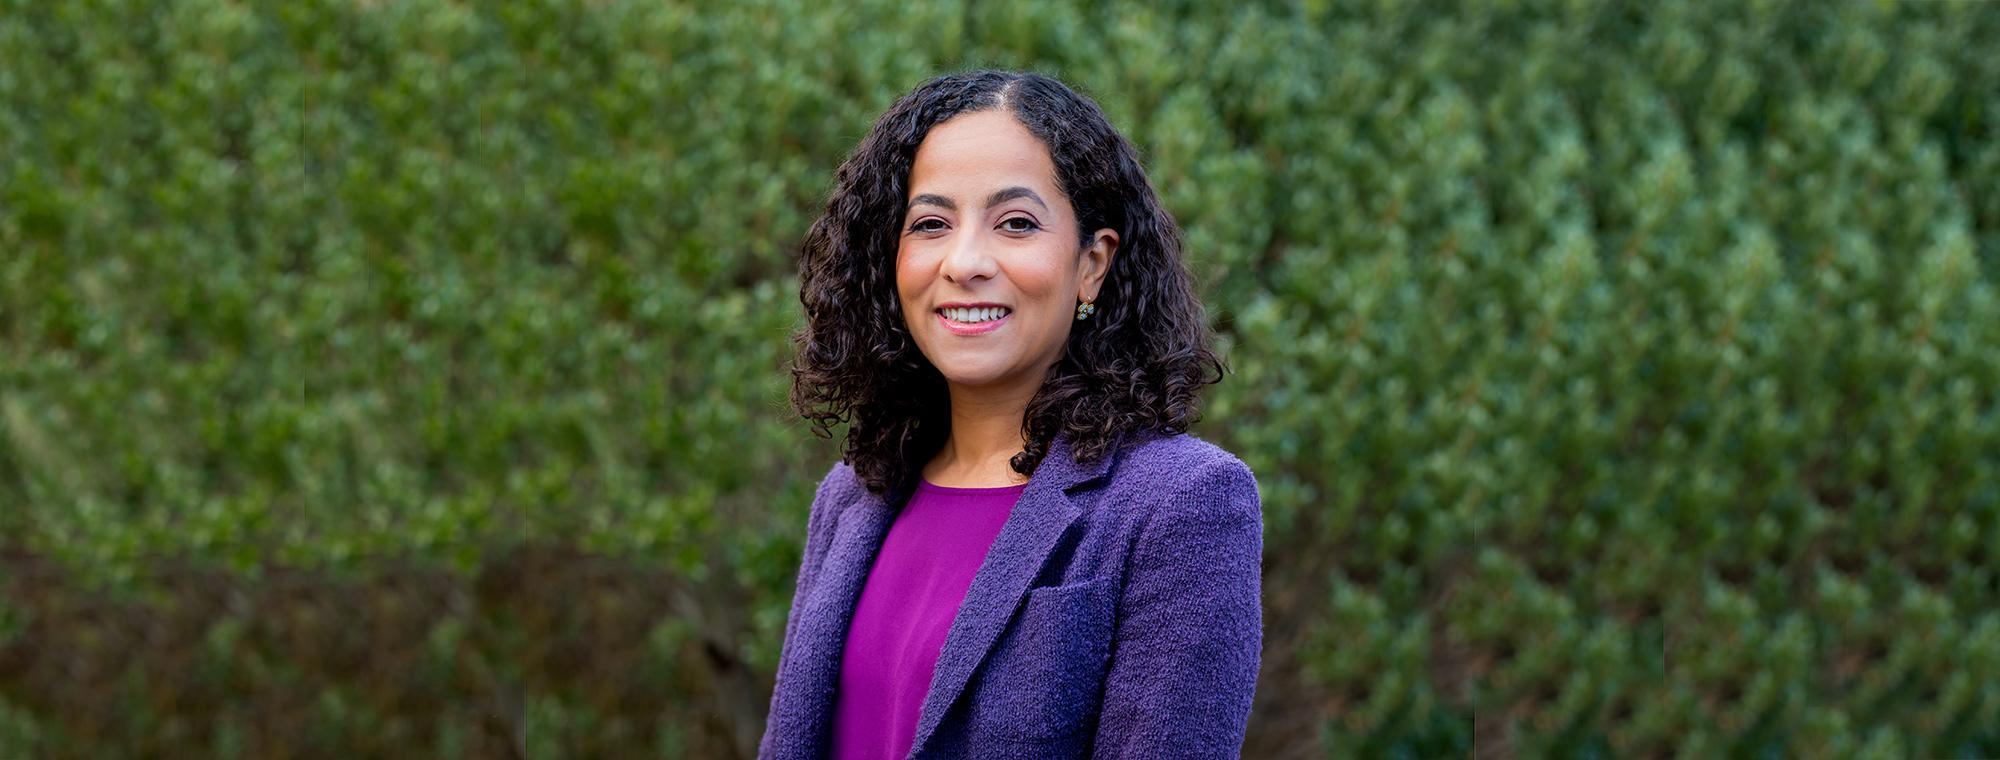 Rahna Epting, executive director of MoveOn